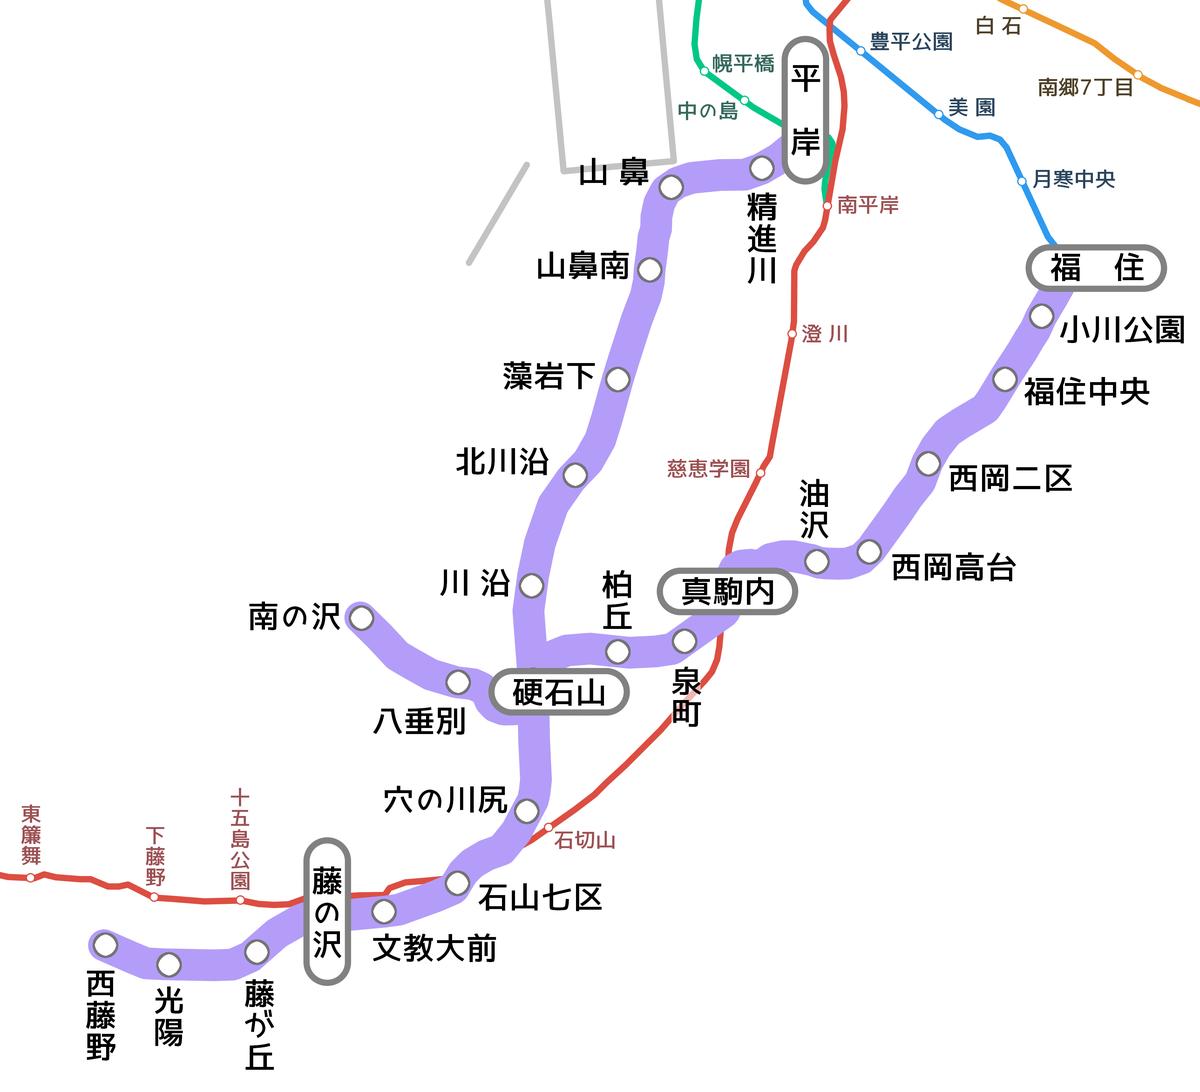 f:id:HOSHIIMO:20210723045858p:plain